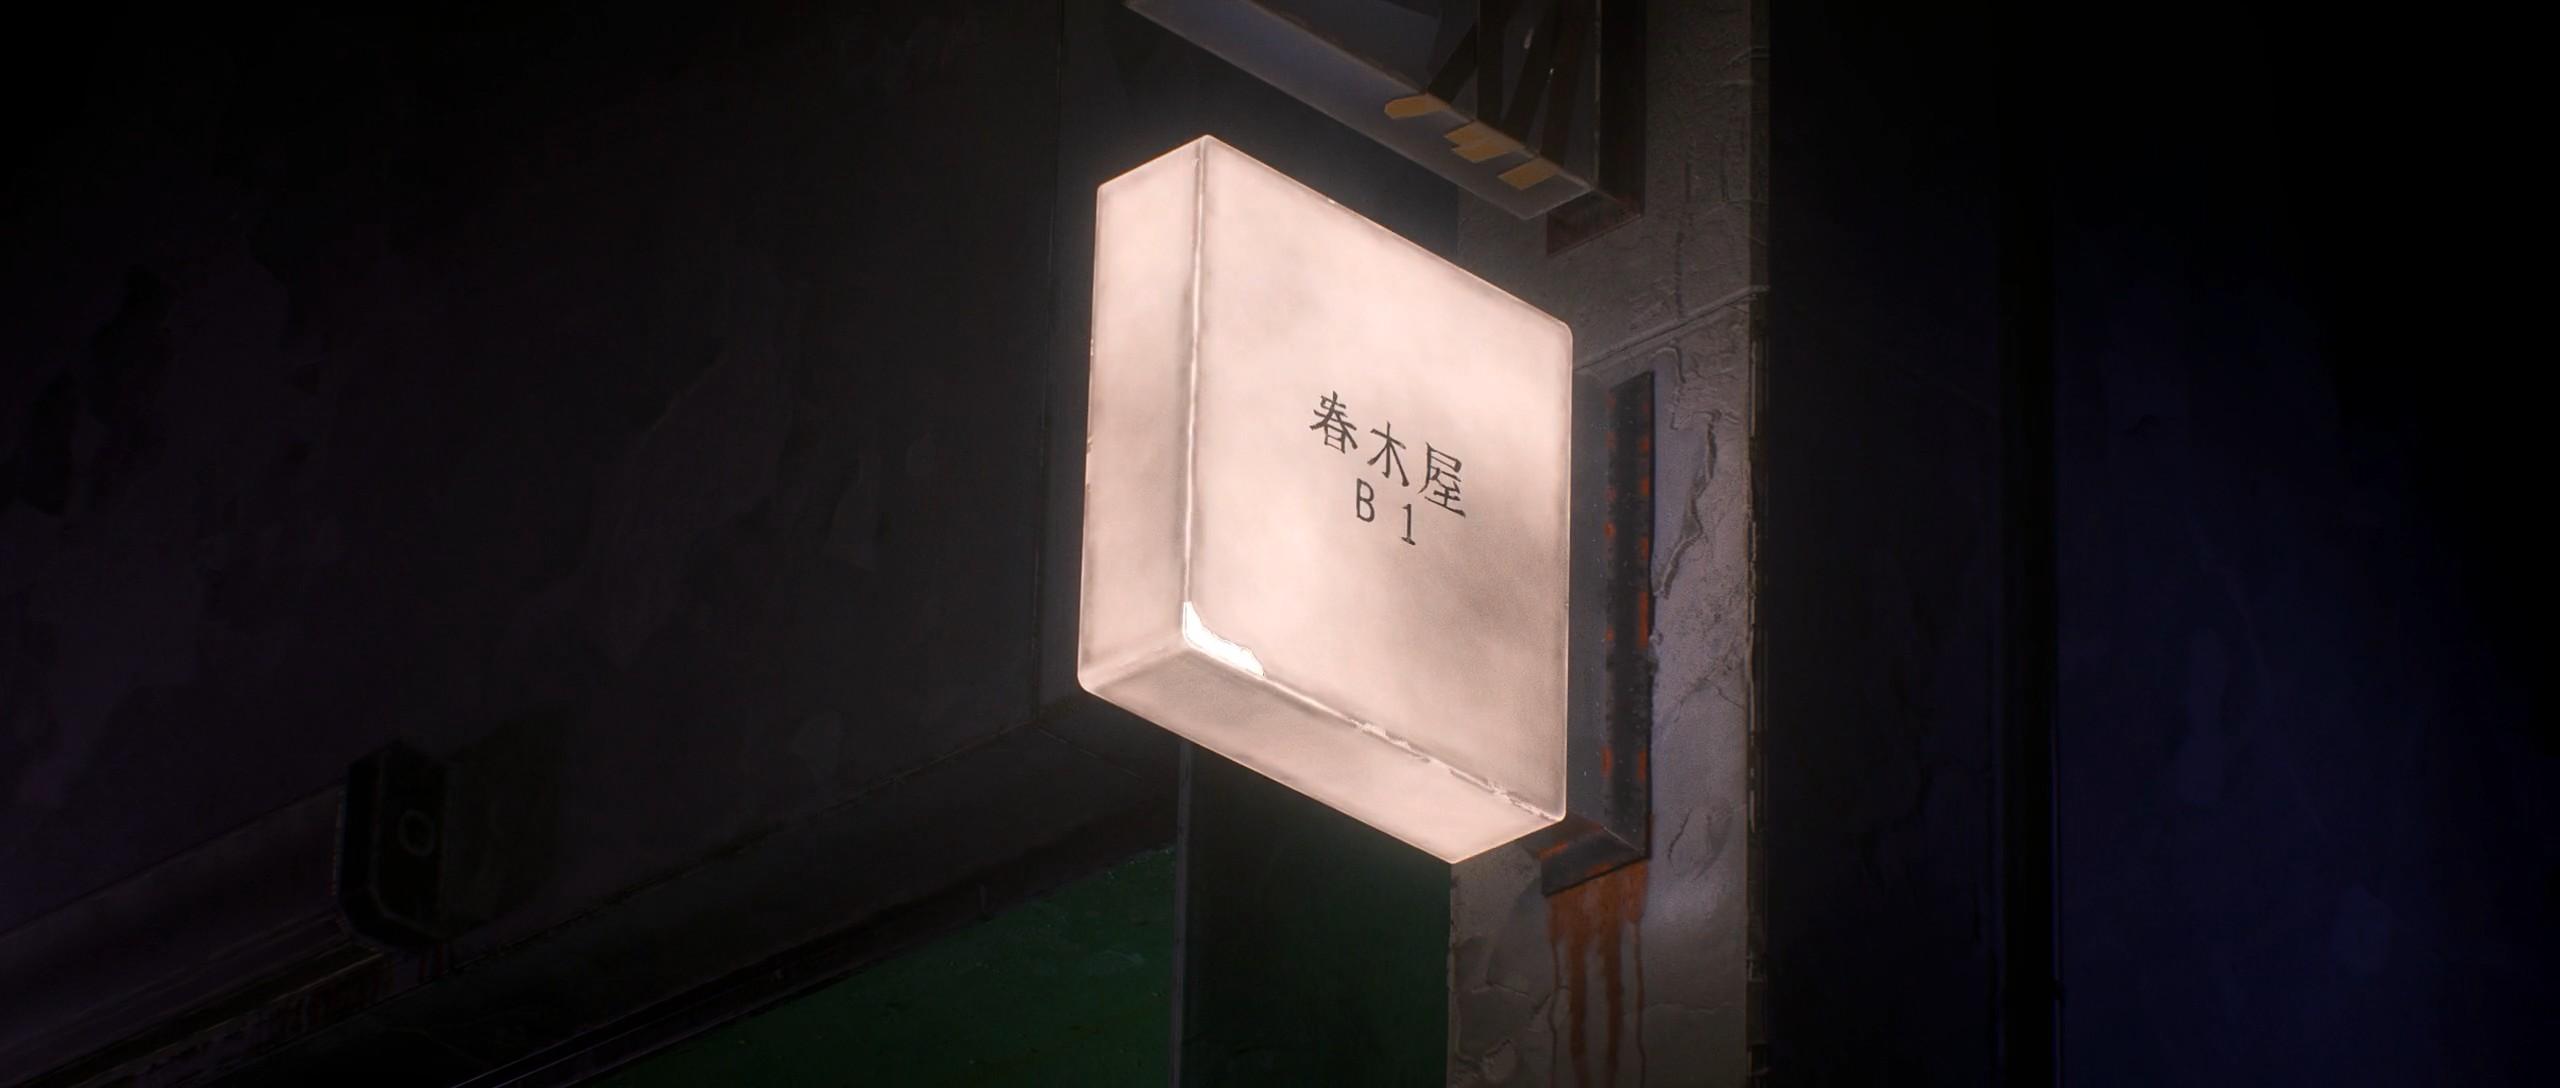 General 2560x1088 Akira Akira awaken akira anime cyberpunk building neo-tokyo city Japan